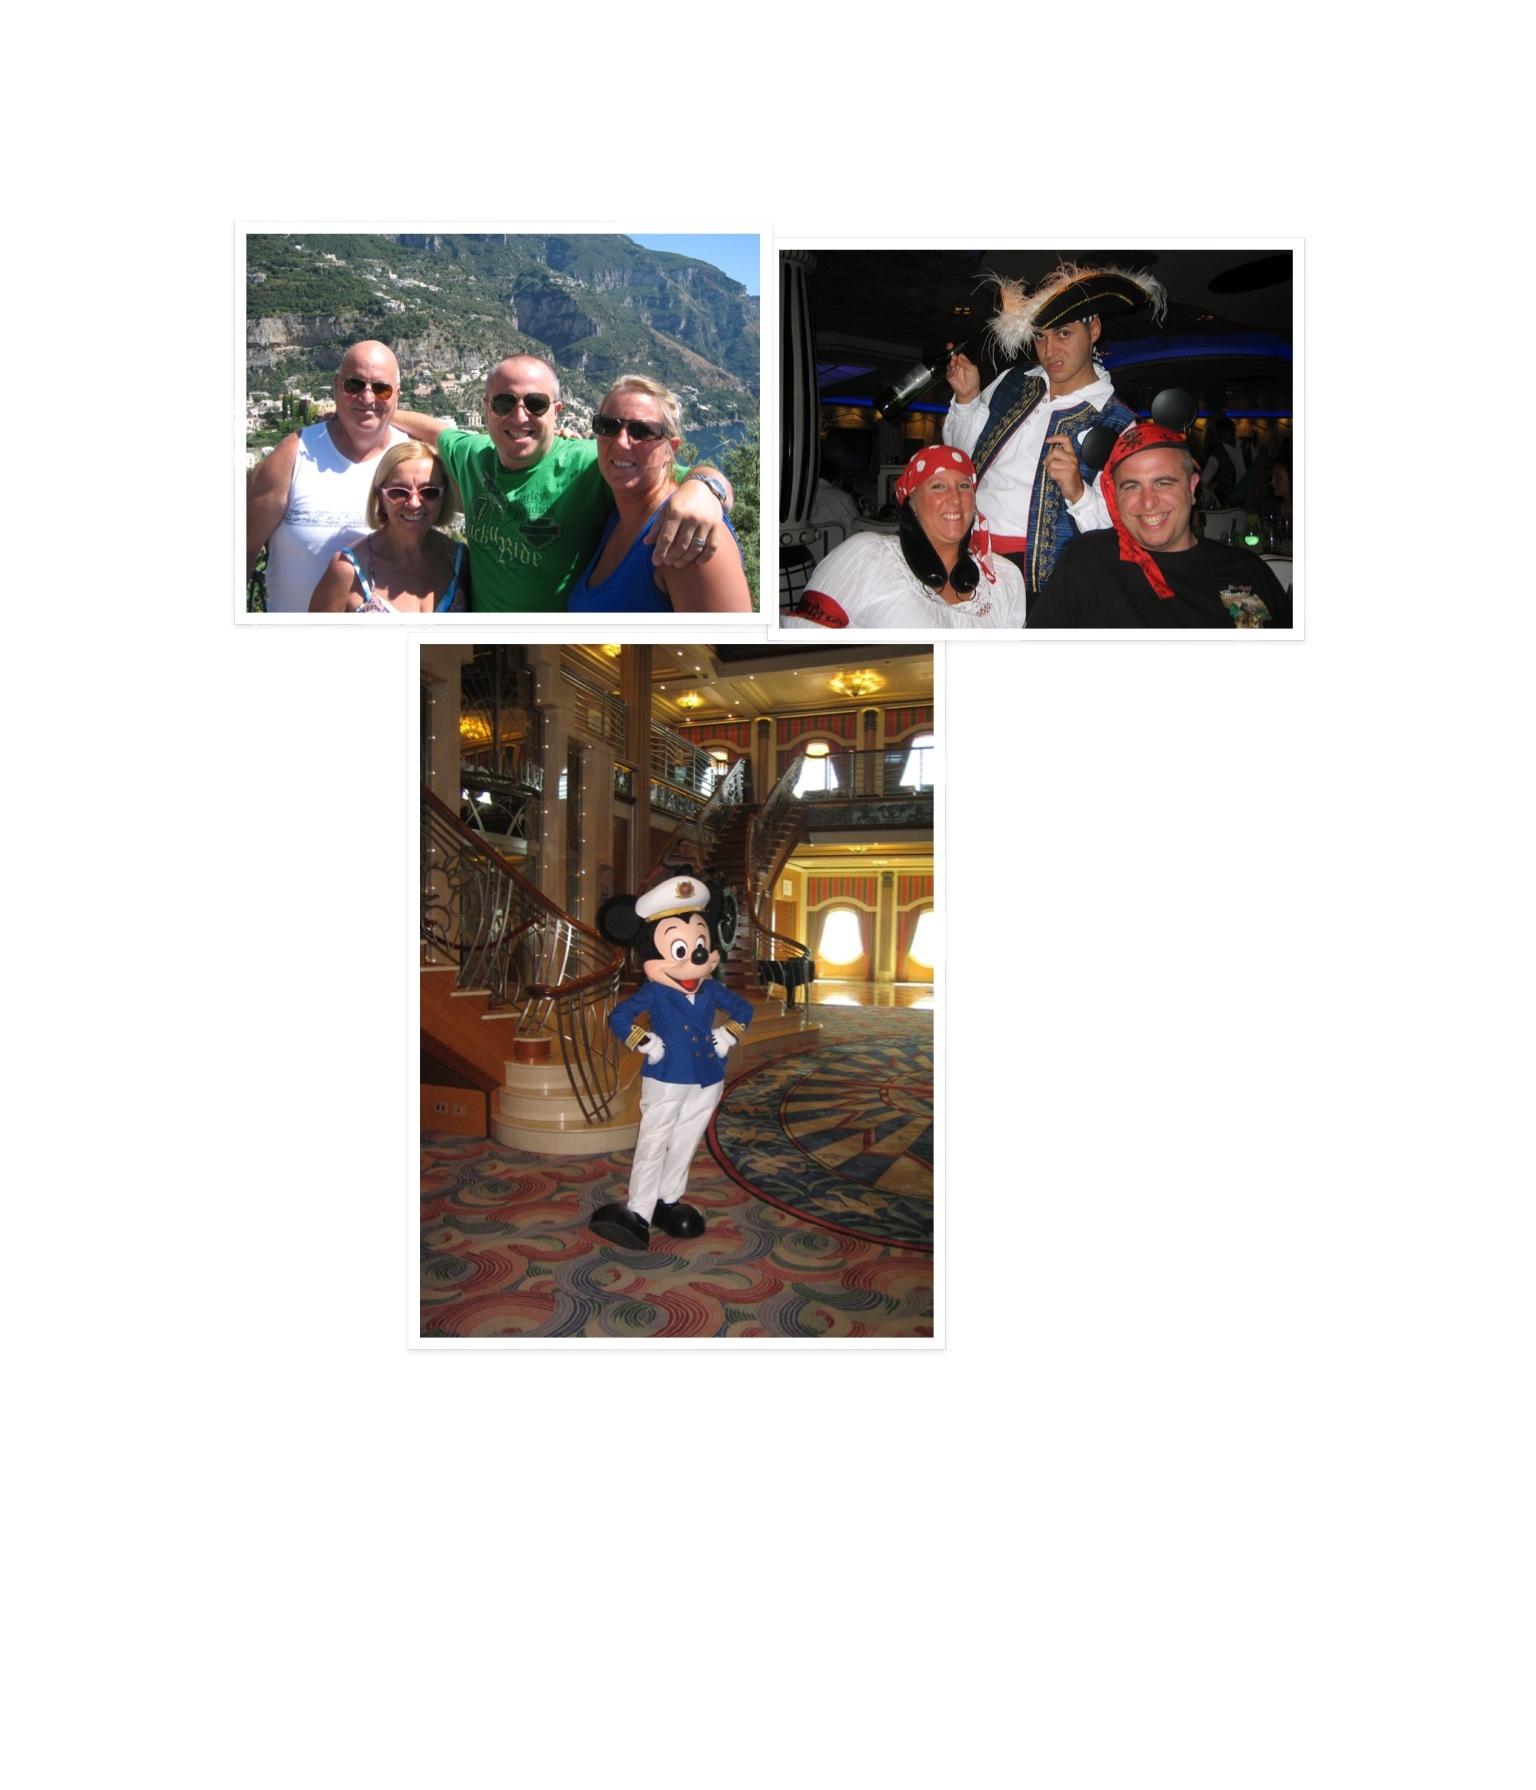 Mediterranean Cruise Disney Magic, August 31, 2013